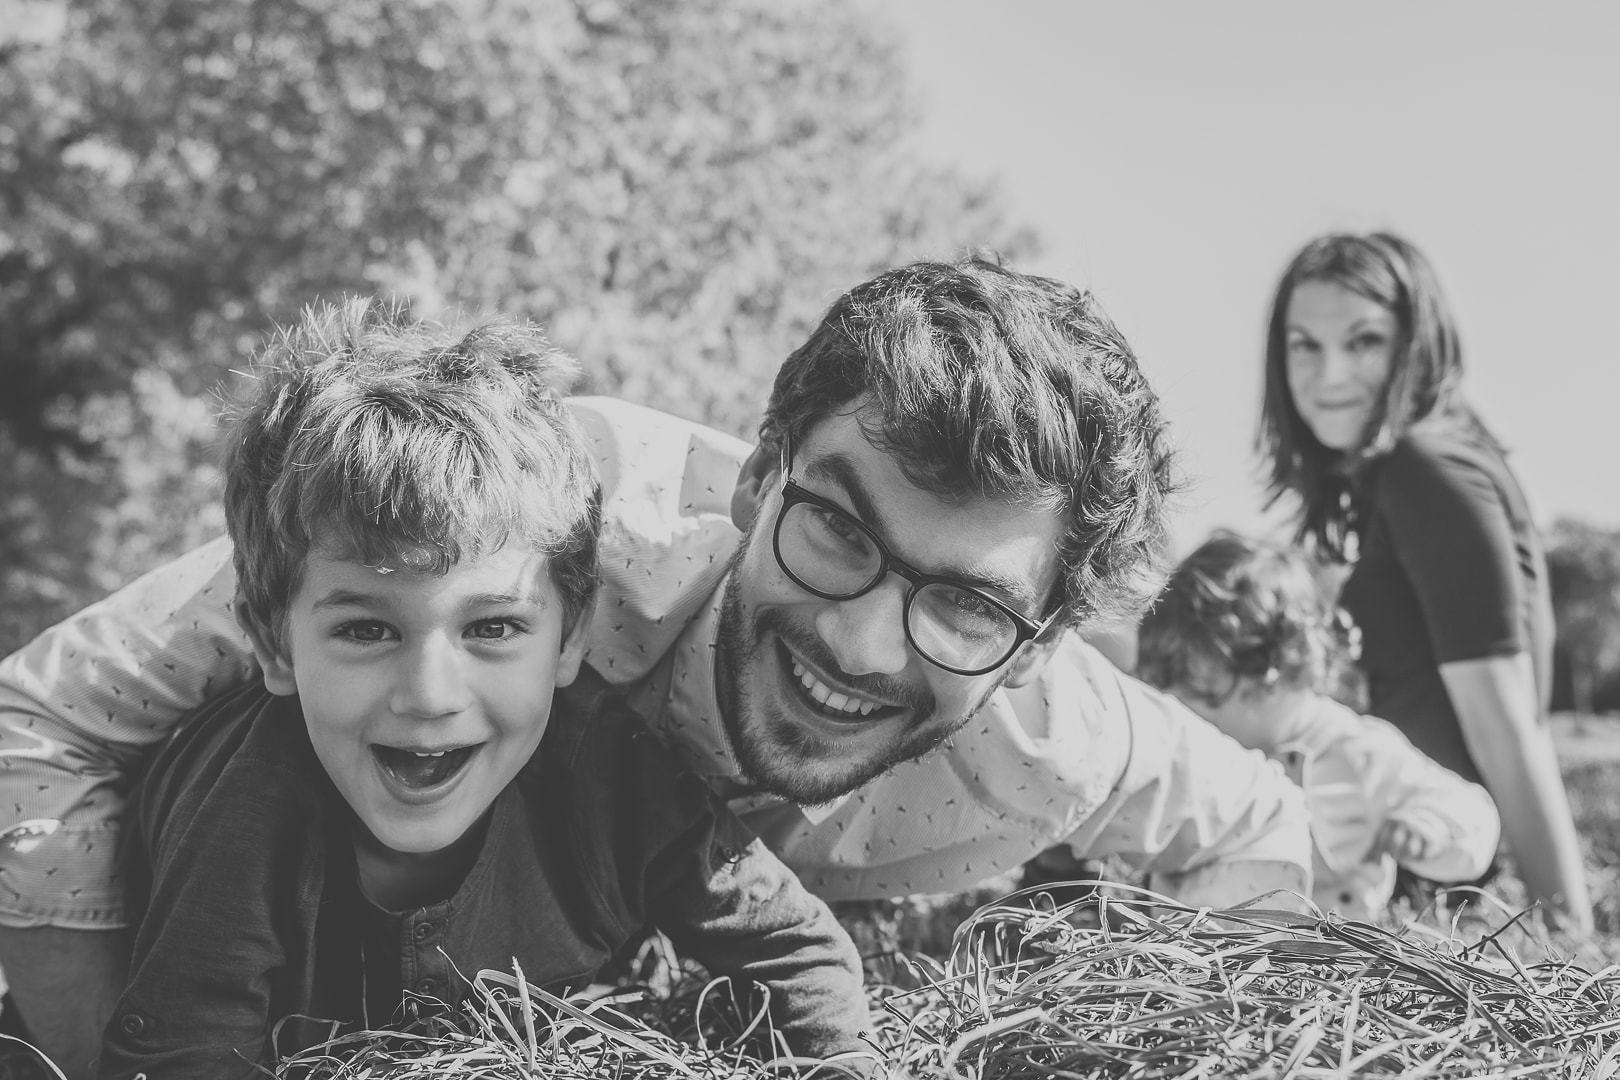 trezors-photography-photographe-professionnel-toulouse-31-enfance-seance-famille-lifestyle (17)